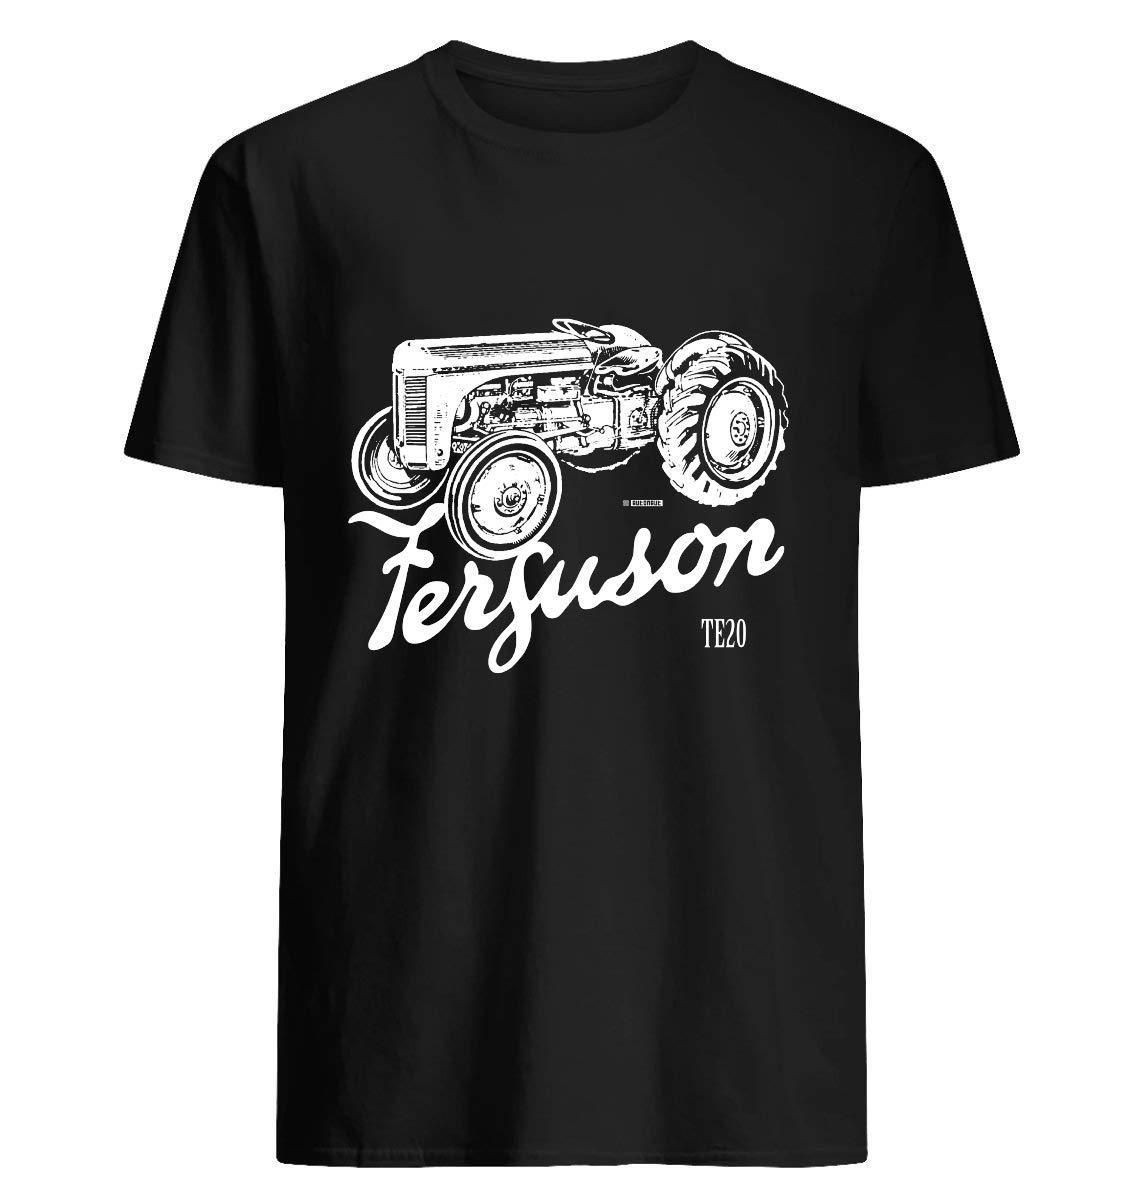 Classic Ferguson Te20 Script And Illustration 84 T Shirt For Unisex